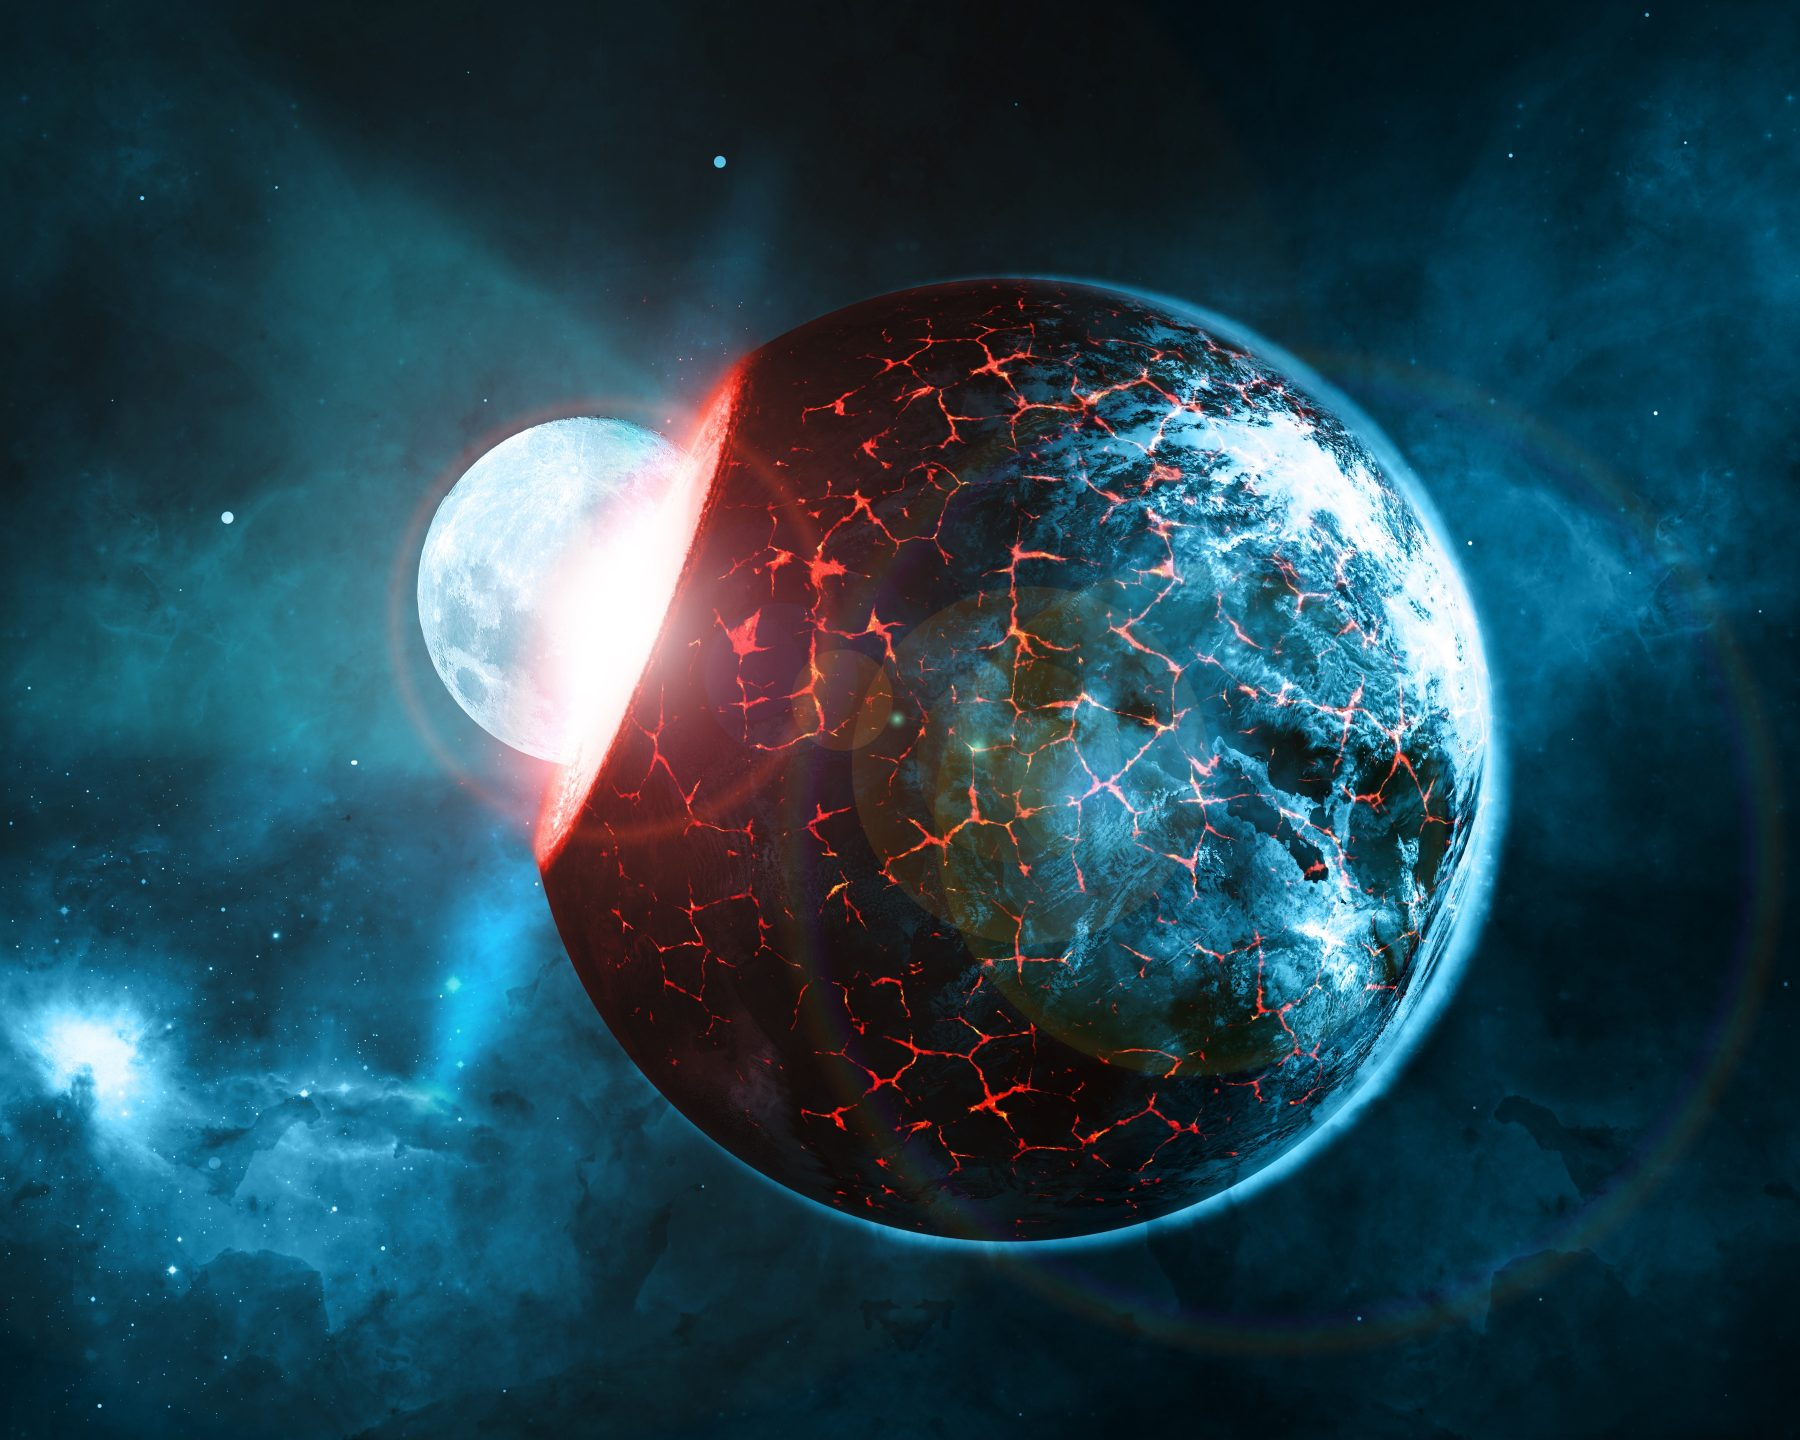 Planet Impact 8K UHD Wallpaper